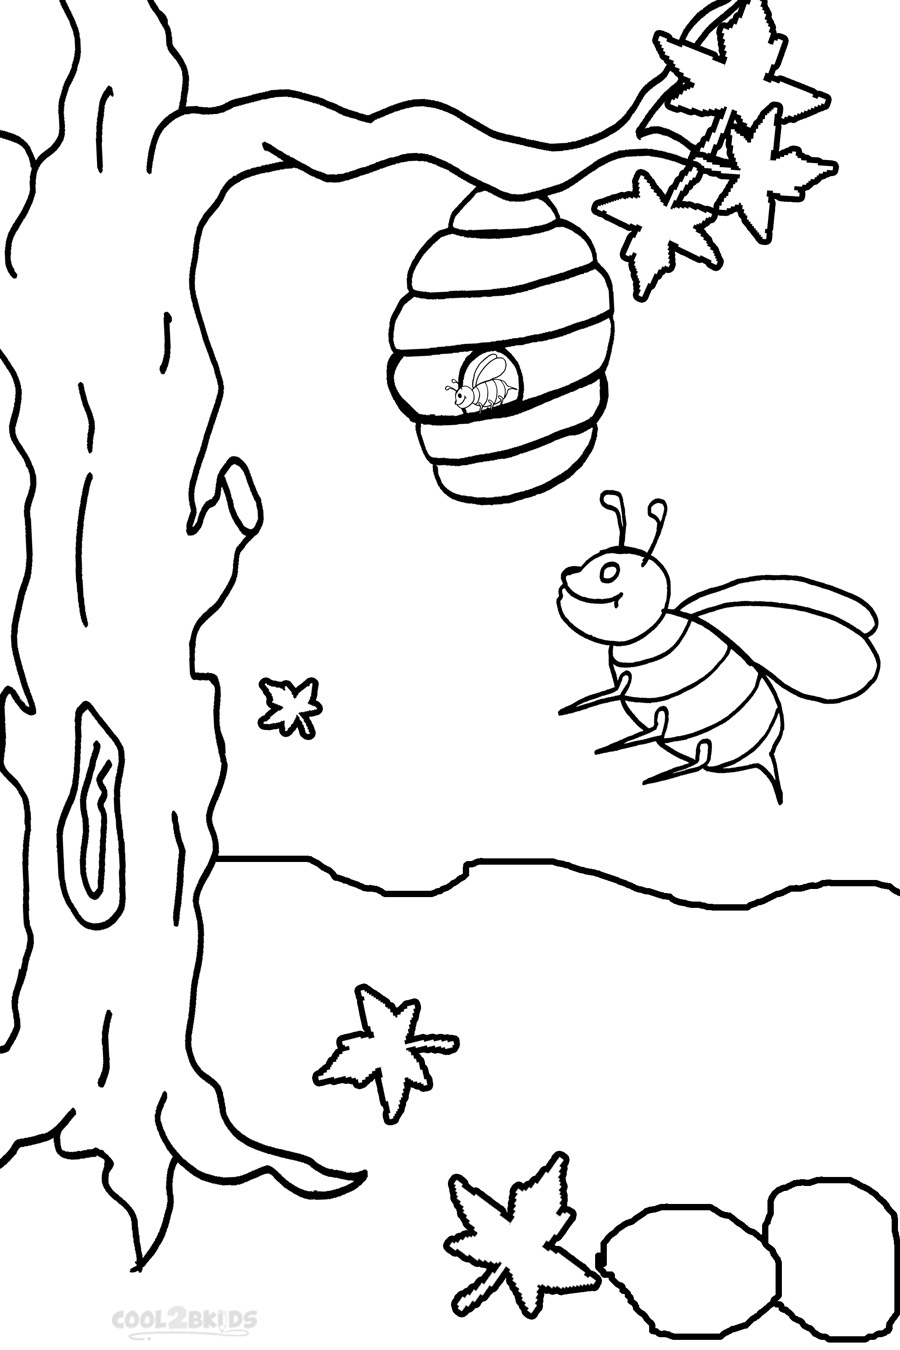 bumble bee coloring pages bumble bee coloring pages bee coloring page